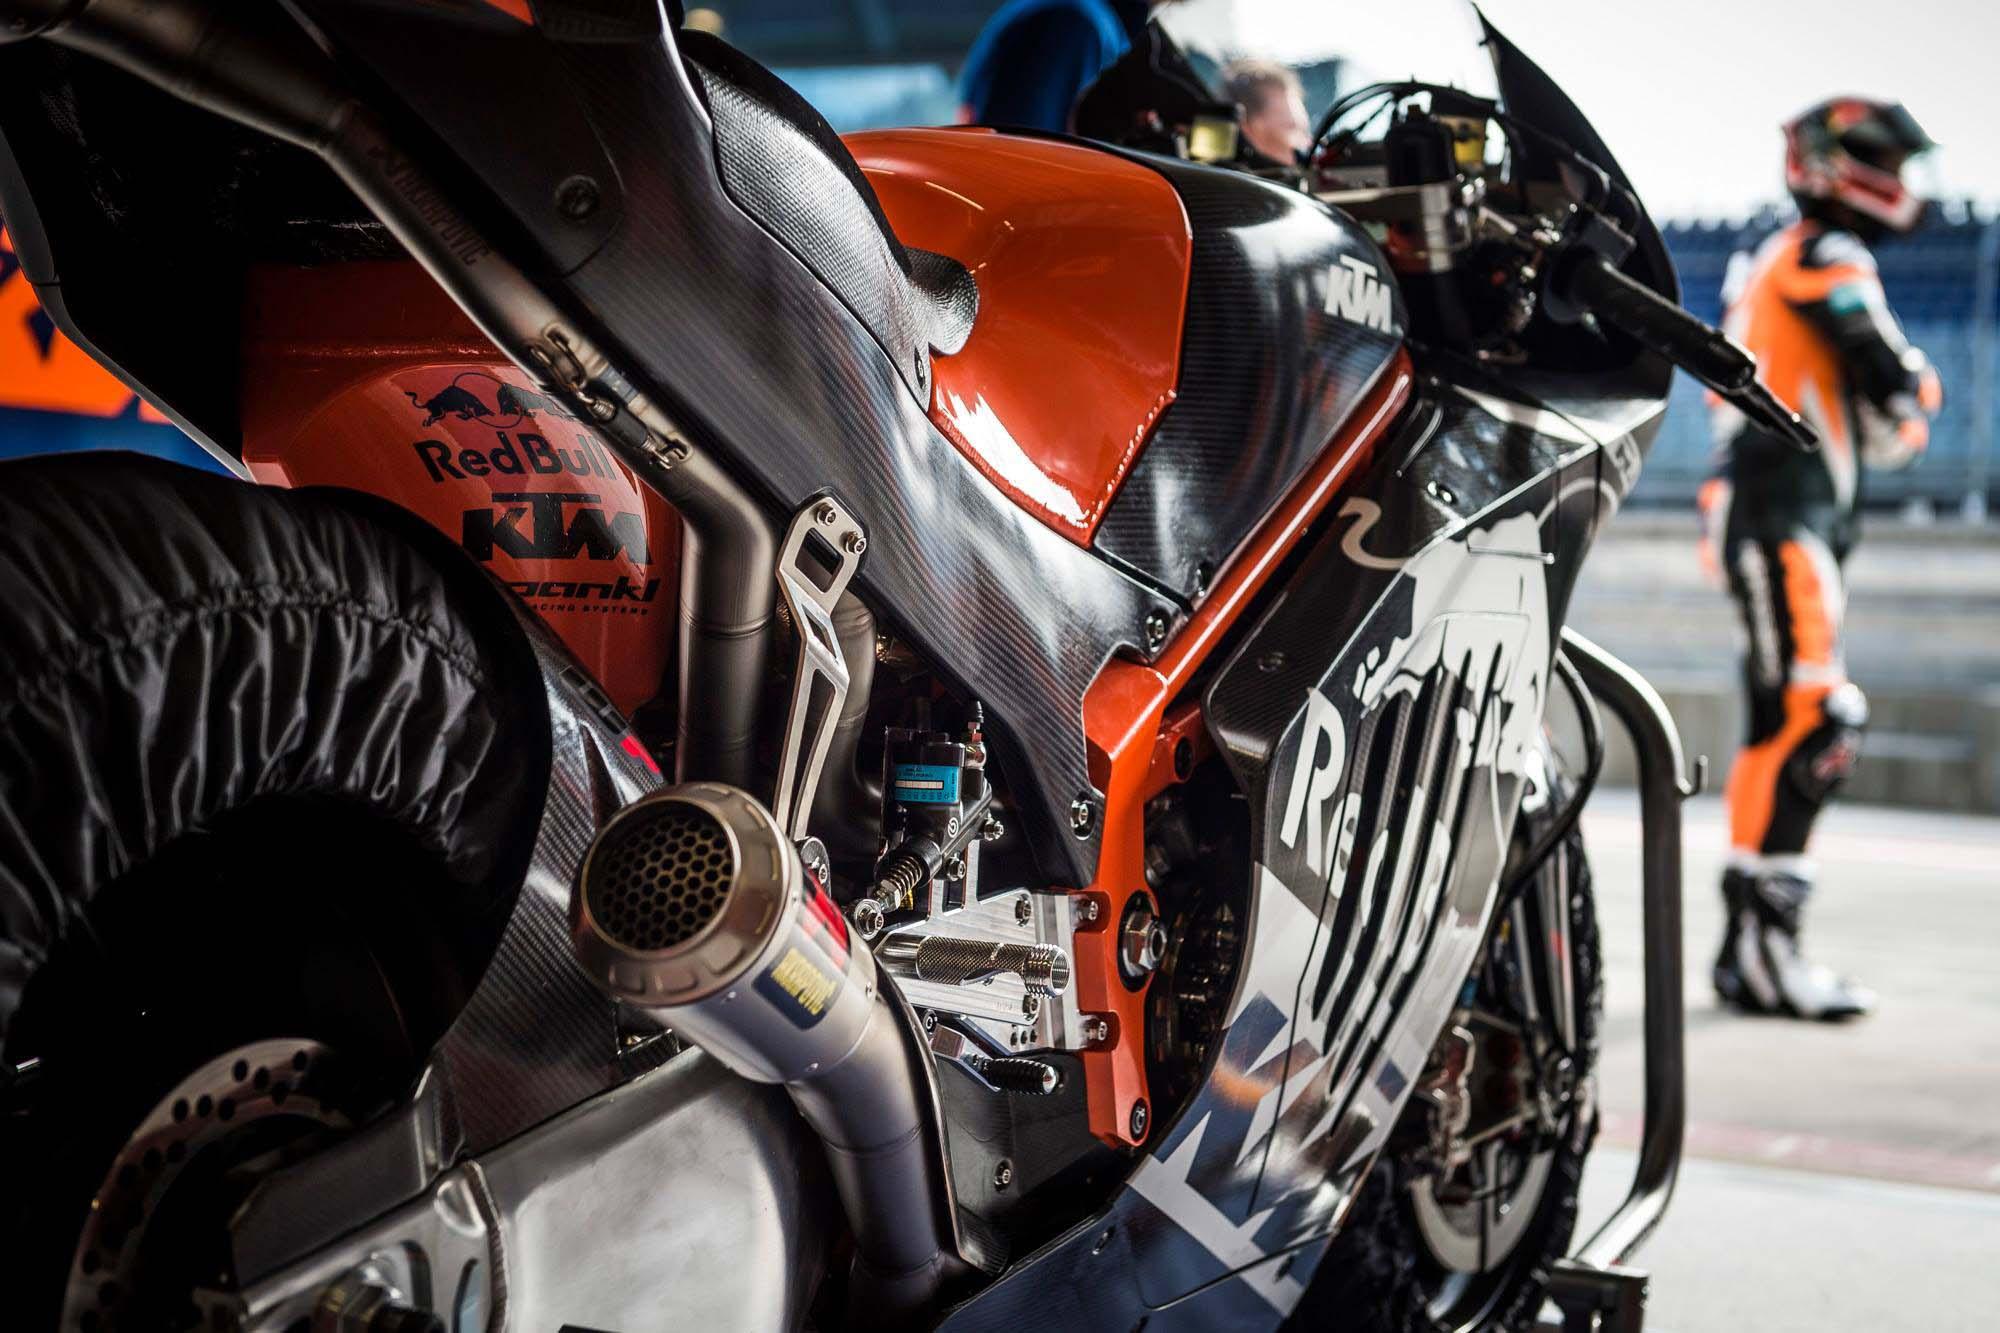 2018 ktm rc16. Wonderful Ktm KTMRC16MotoGPracebikephilipplatzer02 And 2018 Ktm Rc16